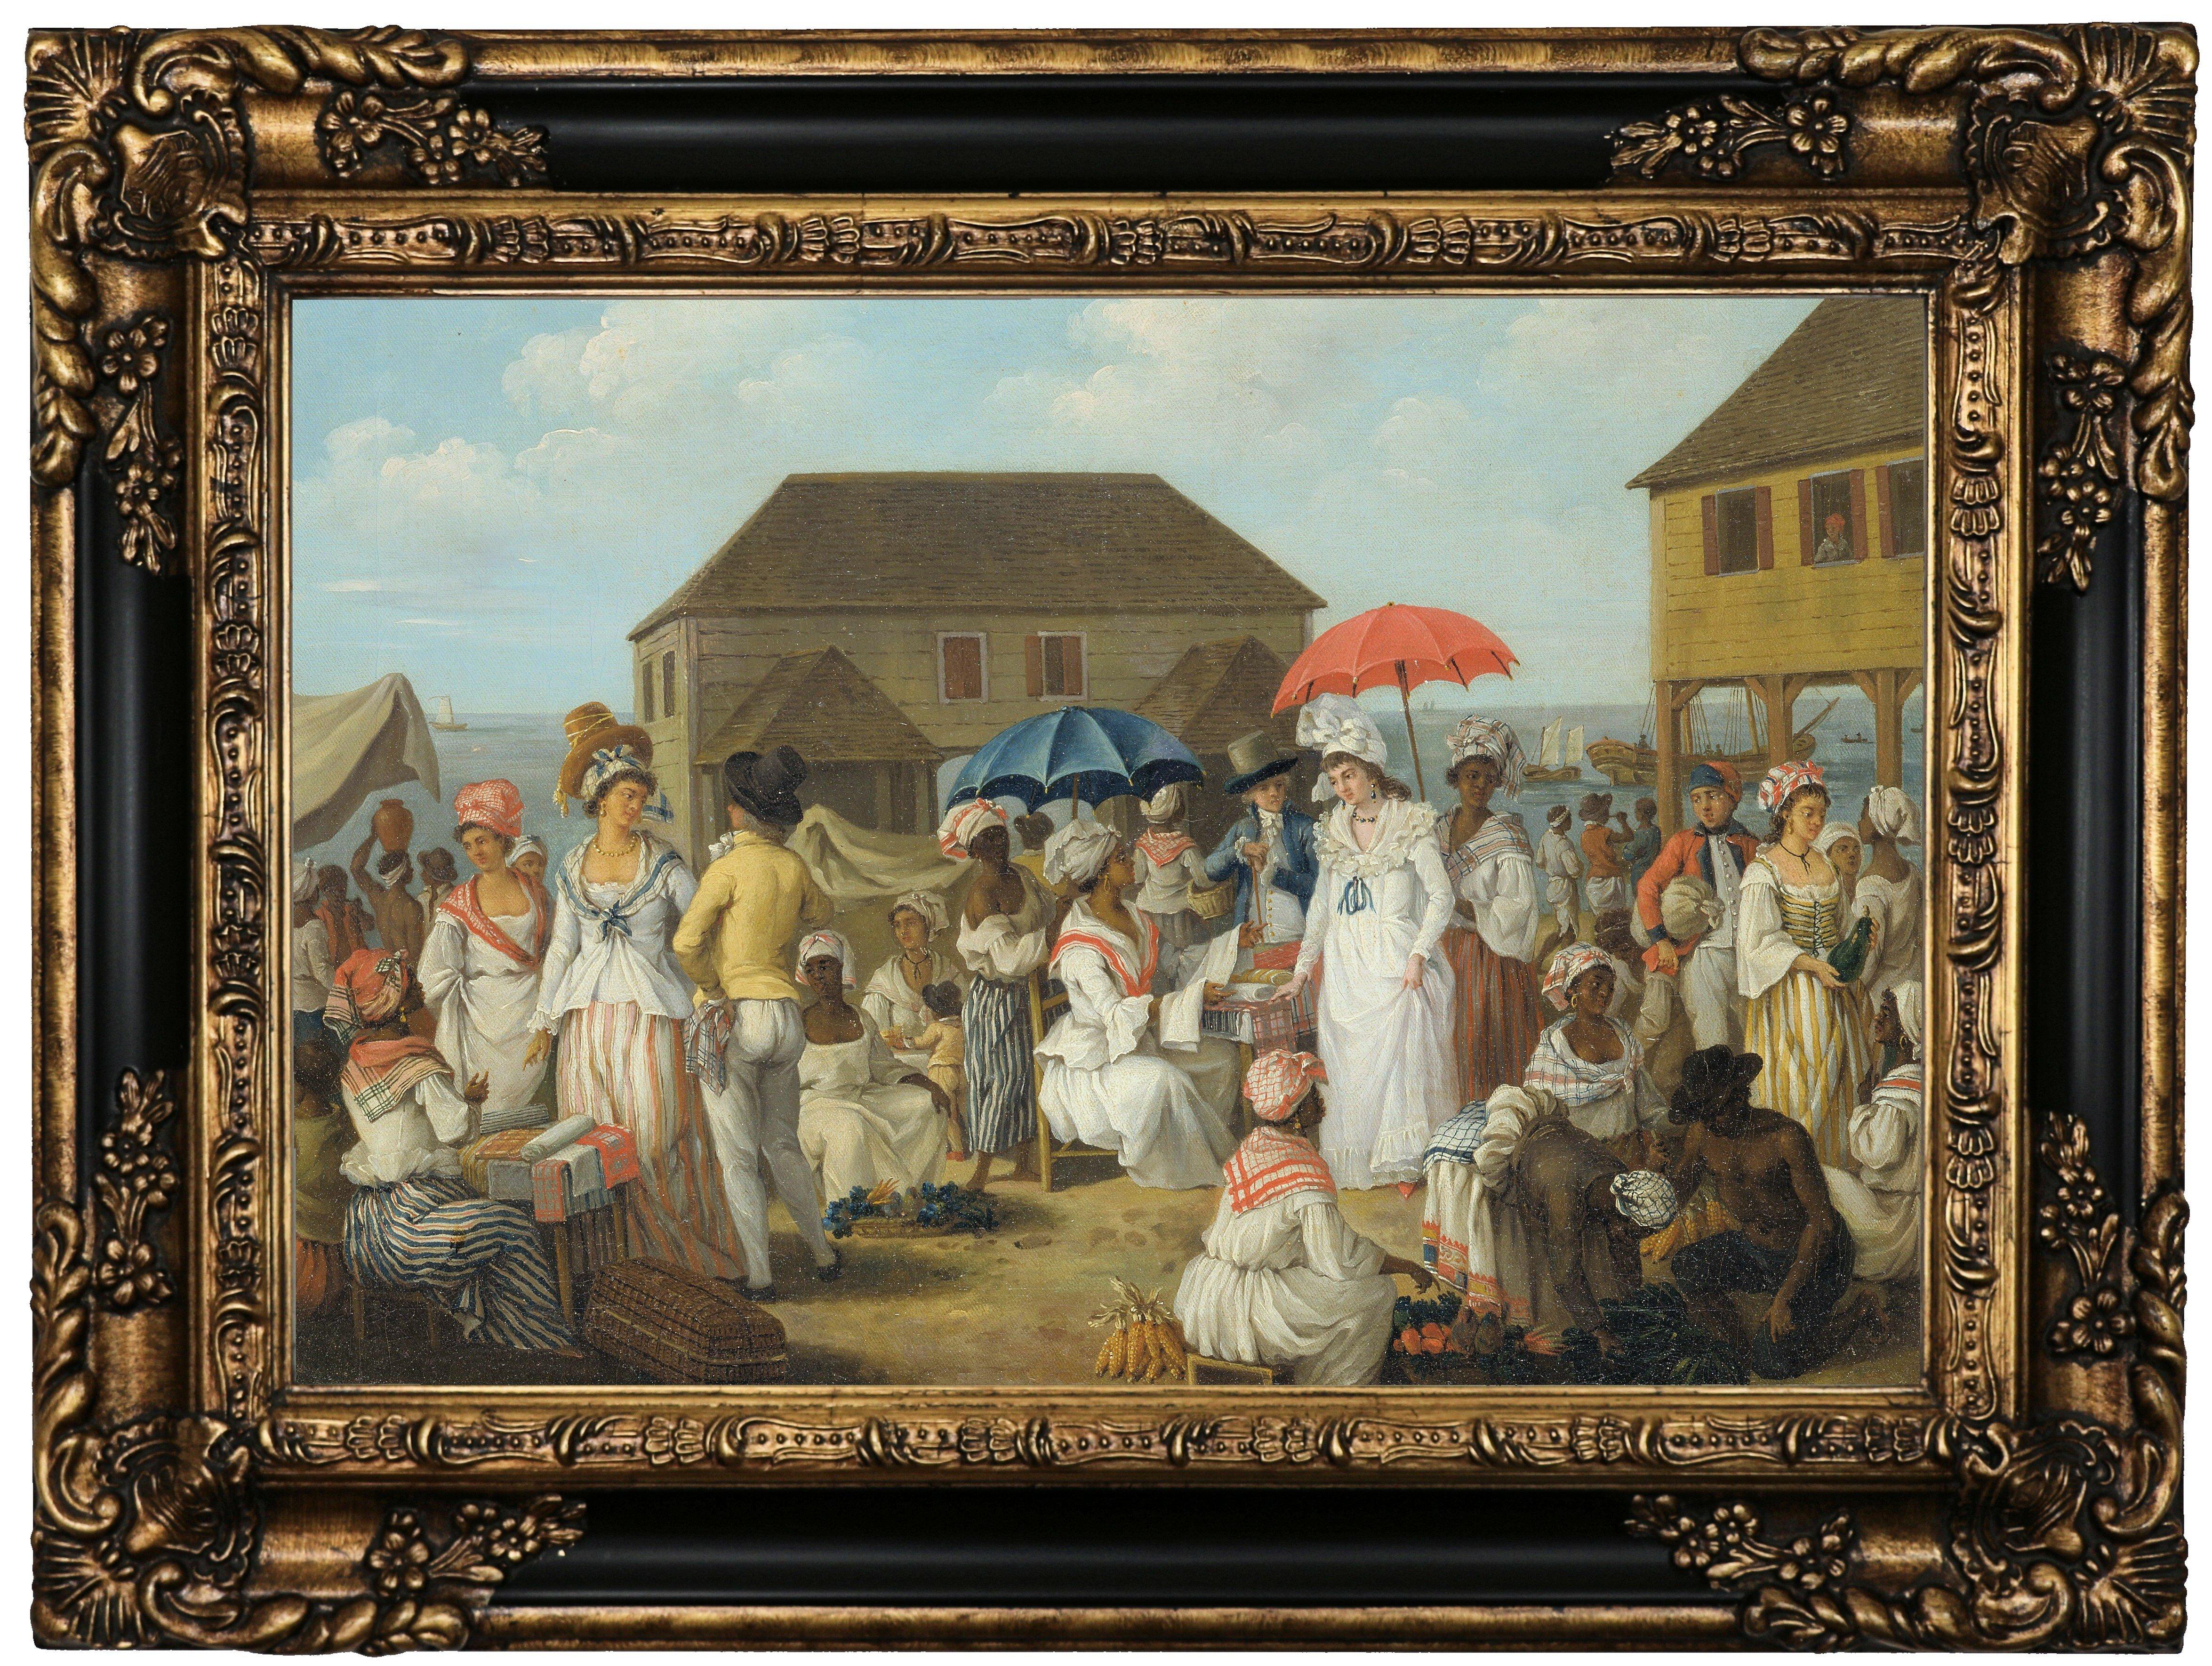 Historic art gallery linen market dominica 1780 framed print on historic art gallery linen market dominica 1780 framed print on canvas wayfair gumiabroncs Images